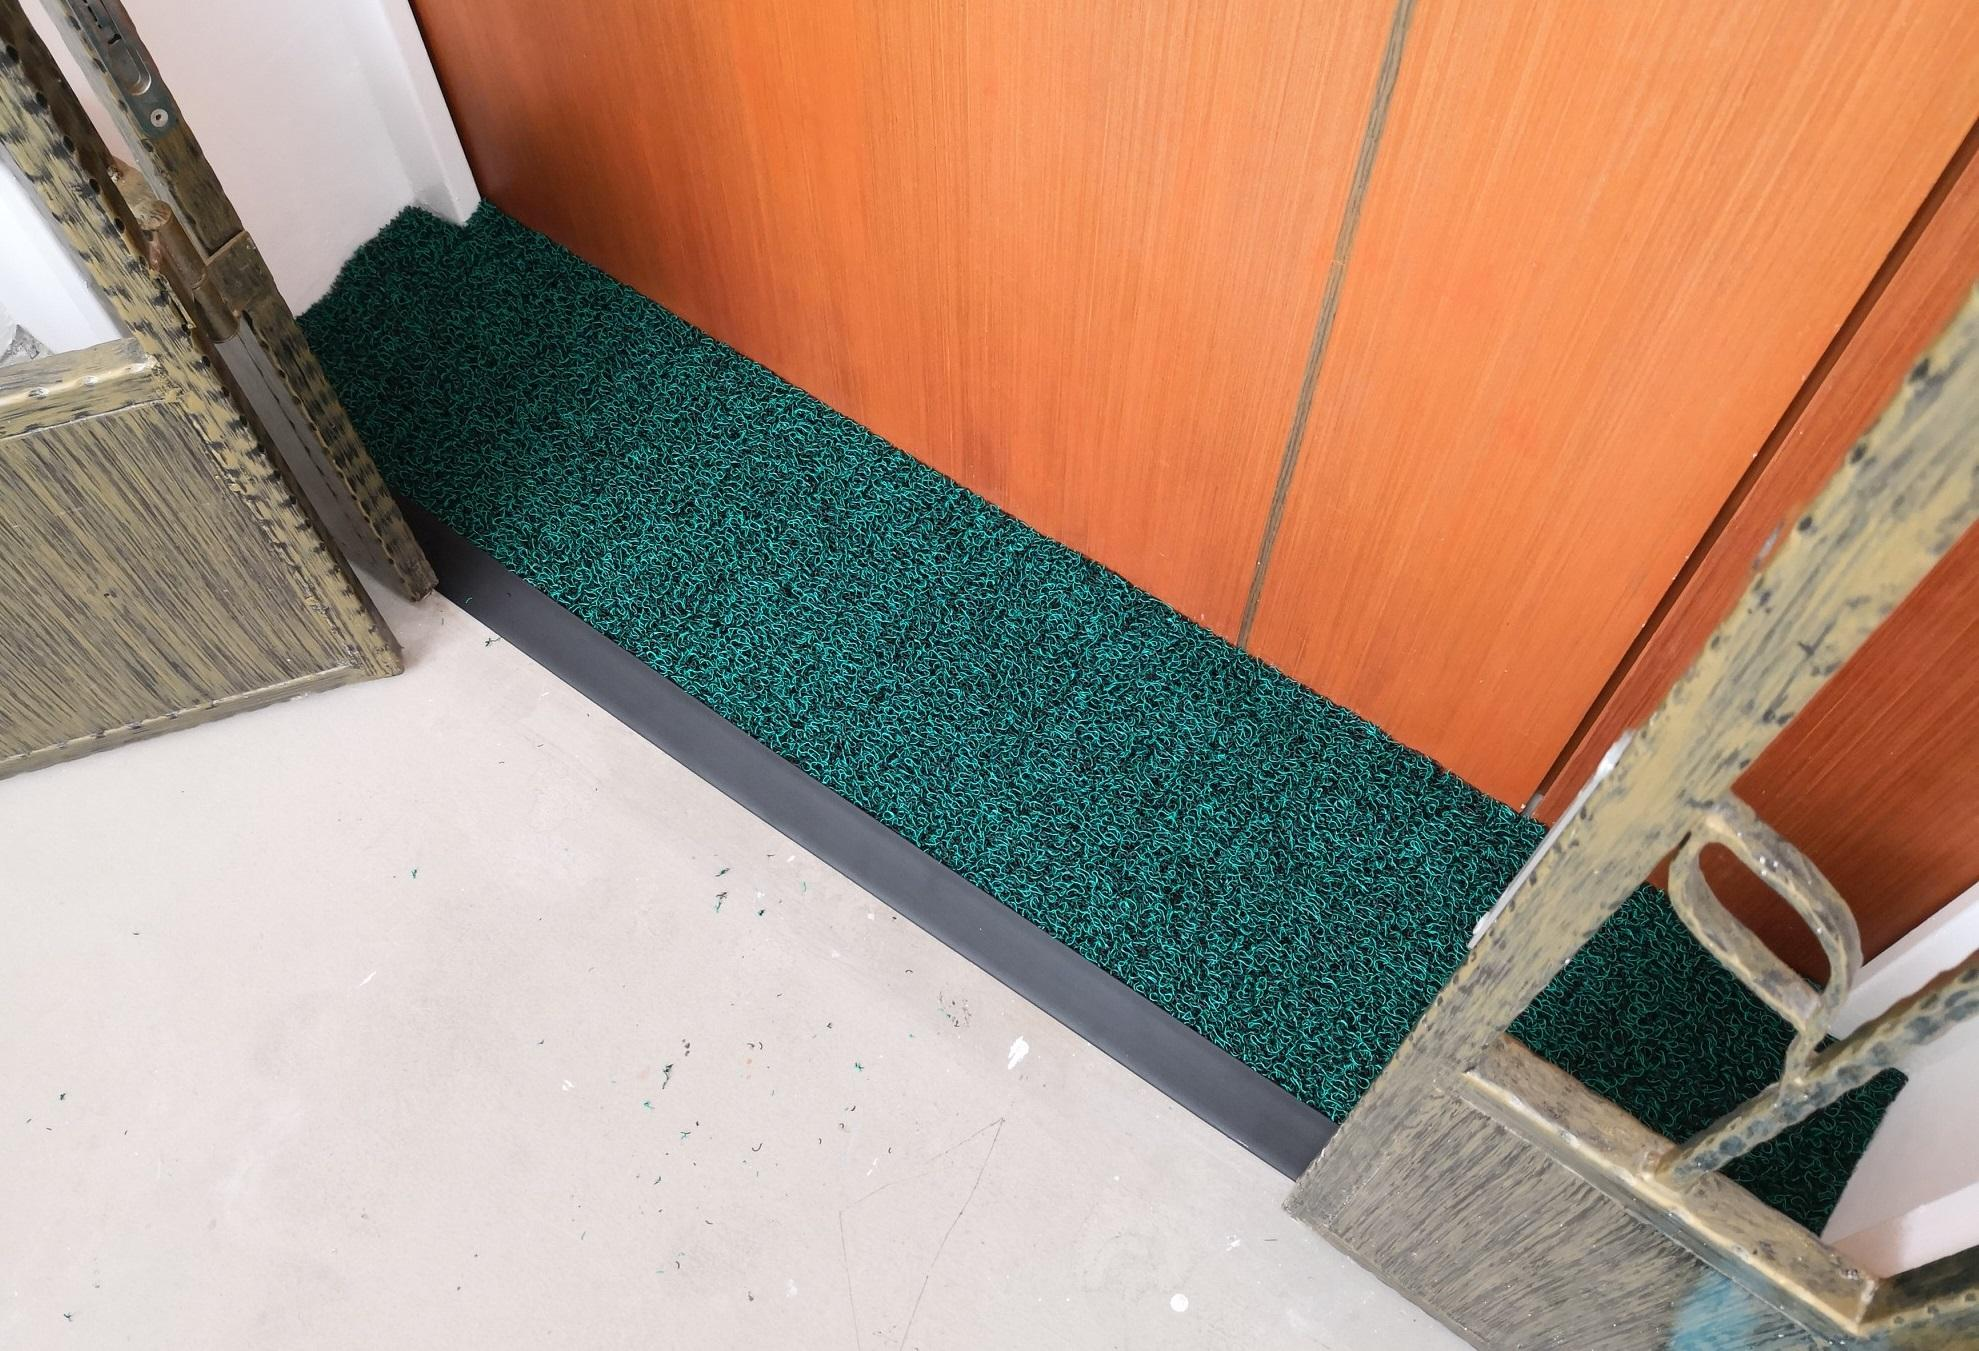 Passorex BTO HDB Door Gap Floor Mat 2.0   L120cm x 29cm @ L125cm x 27cm  Mat thickness T13mm+/-  Black/Green